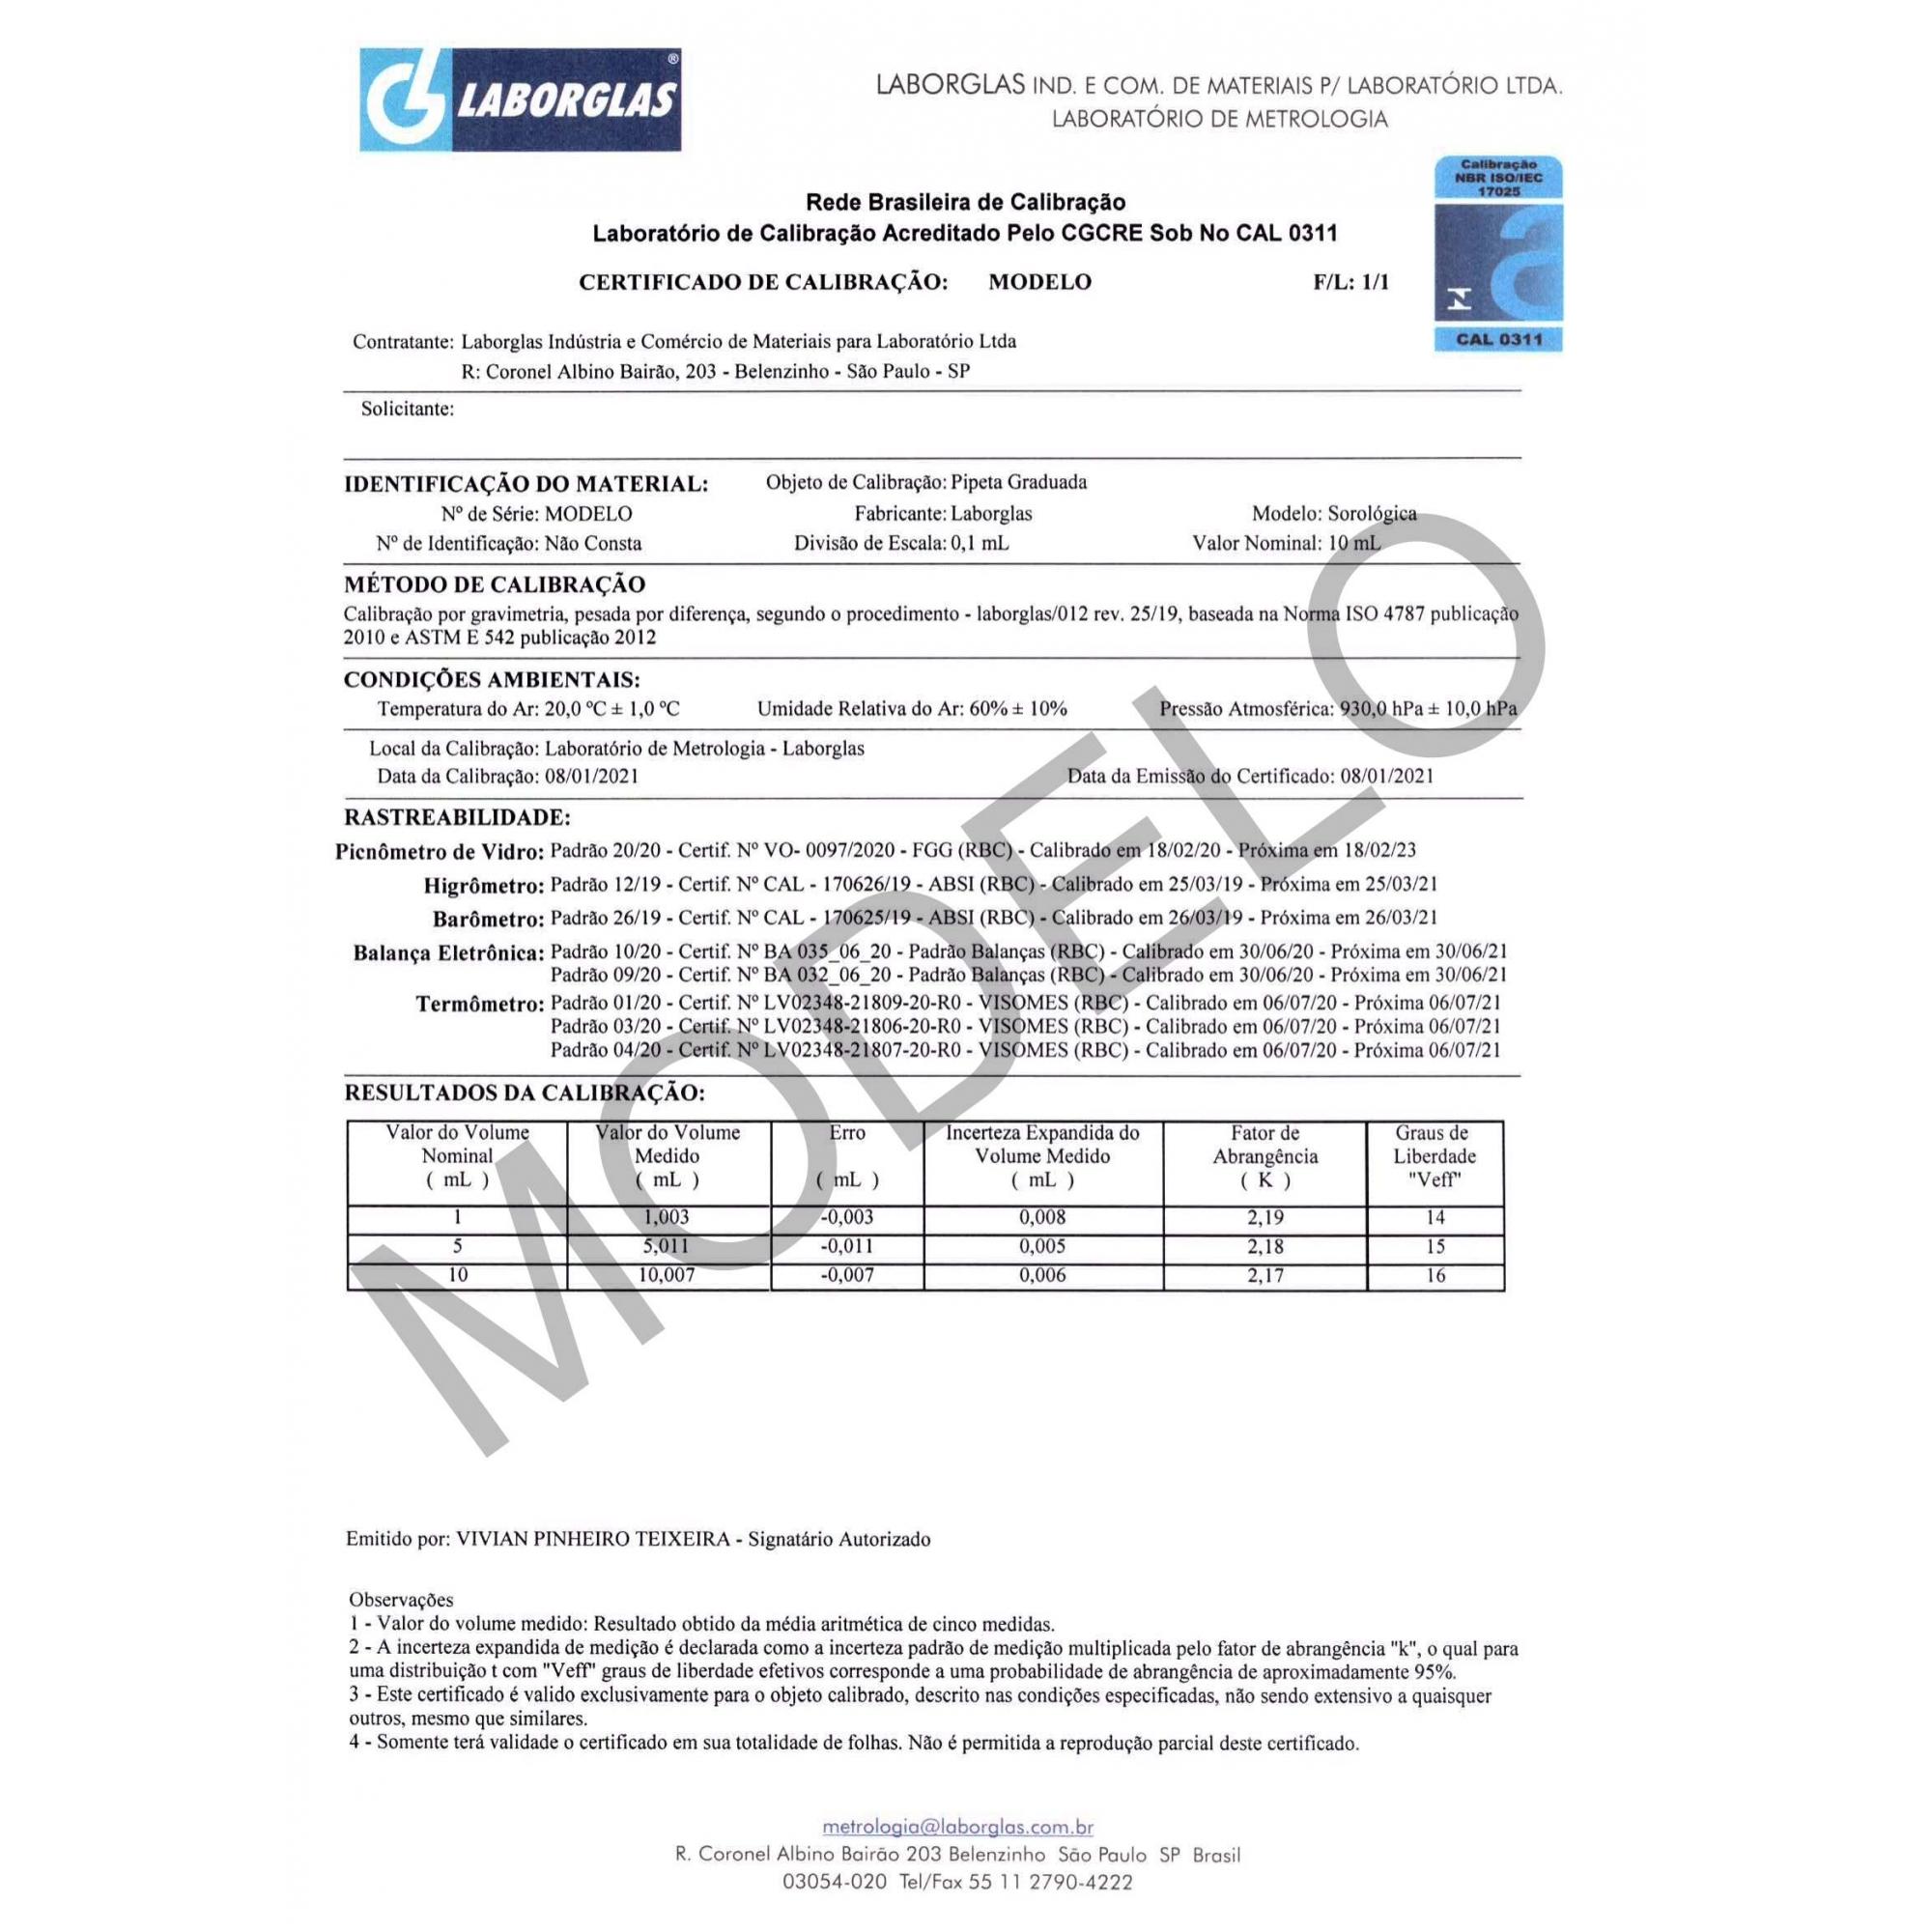 PIPETA GRADUADA SOROLÓGICA ESGOTOTAMENTO TOTAL 1 ML 1/10 CLASSE A COM CERTIFICADO RBC - Laborglas - Cód. 9443606-R